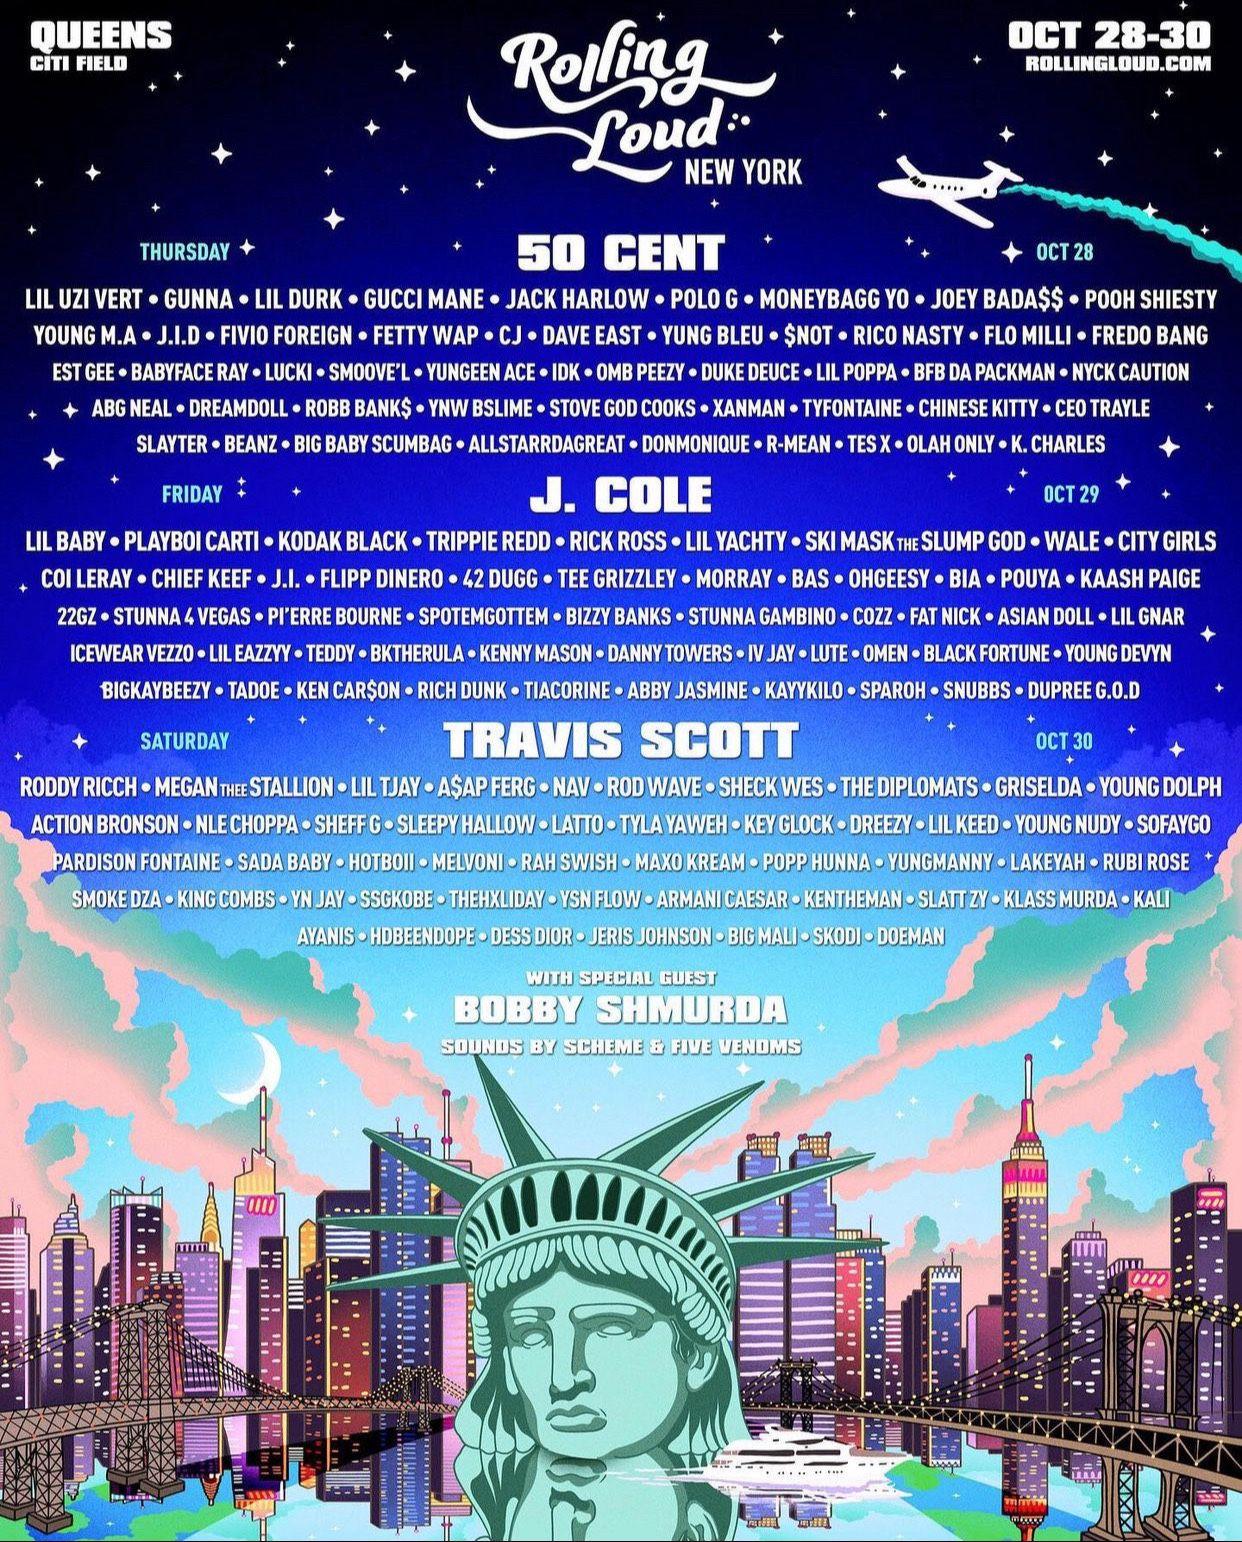 Rolling Loud New York (2 Tickets)